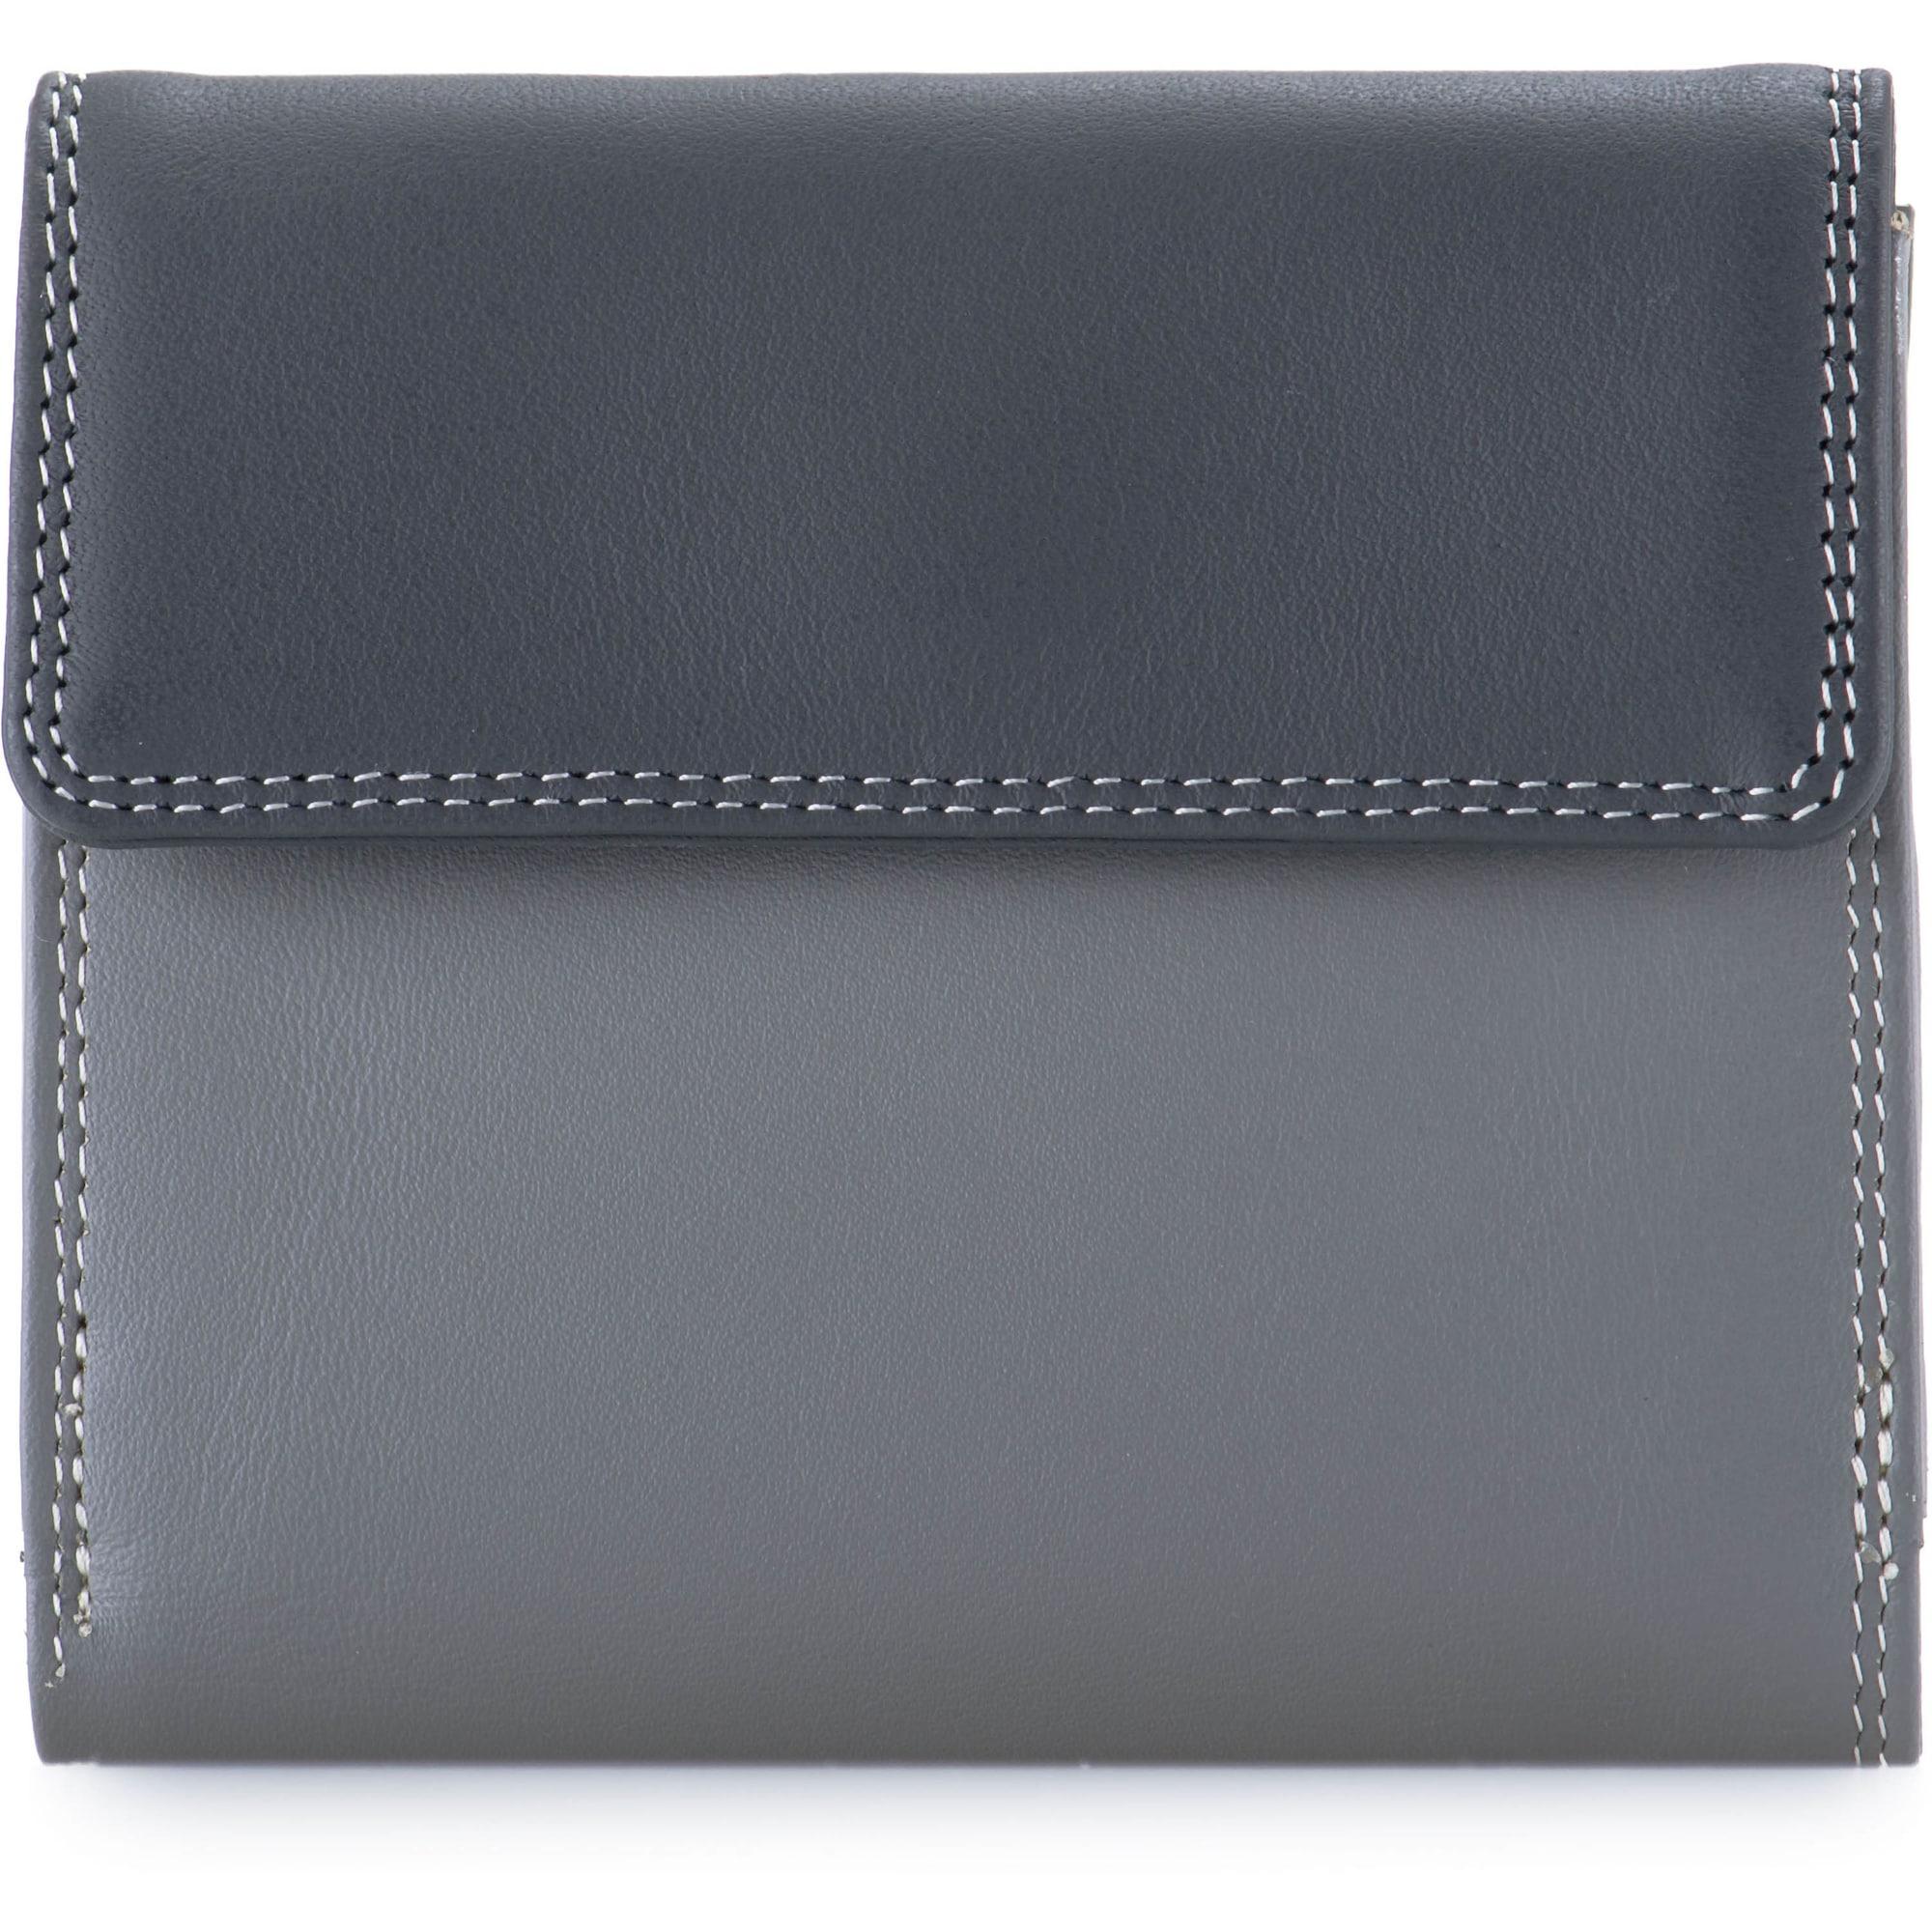 Geldbörse | Accessoires > Portemonnaies | Mywalit